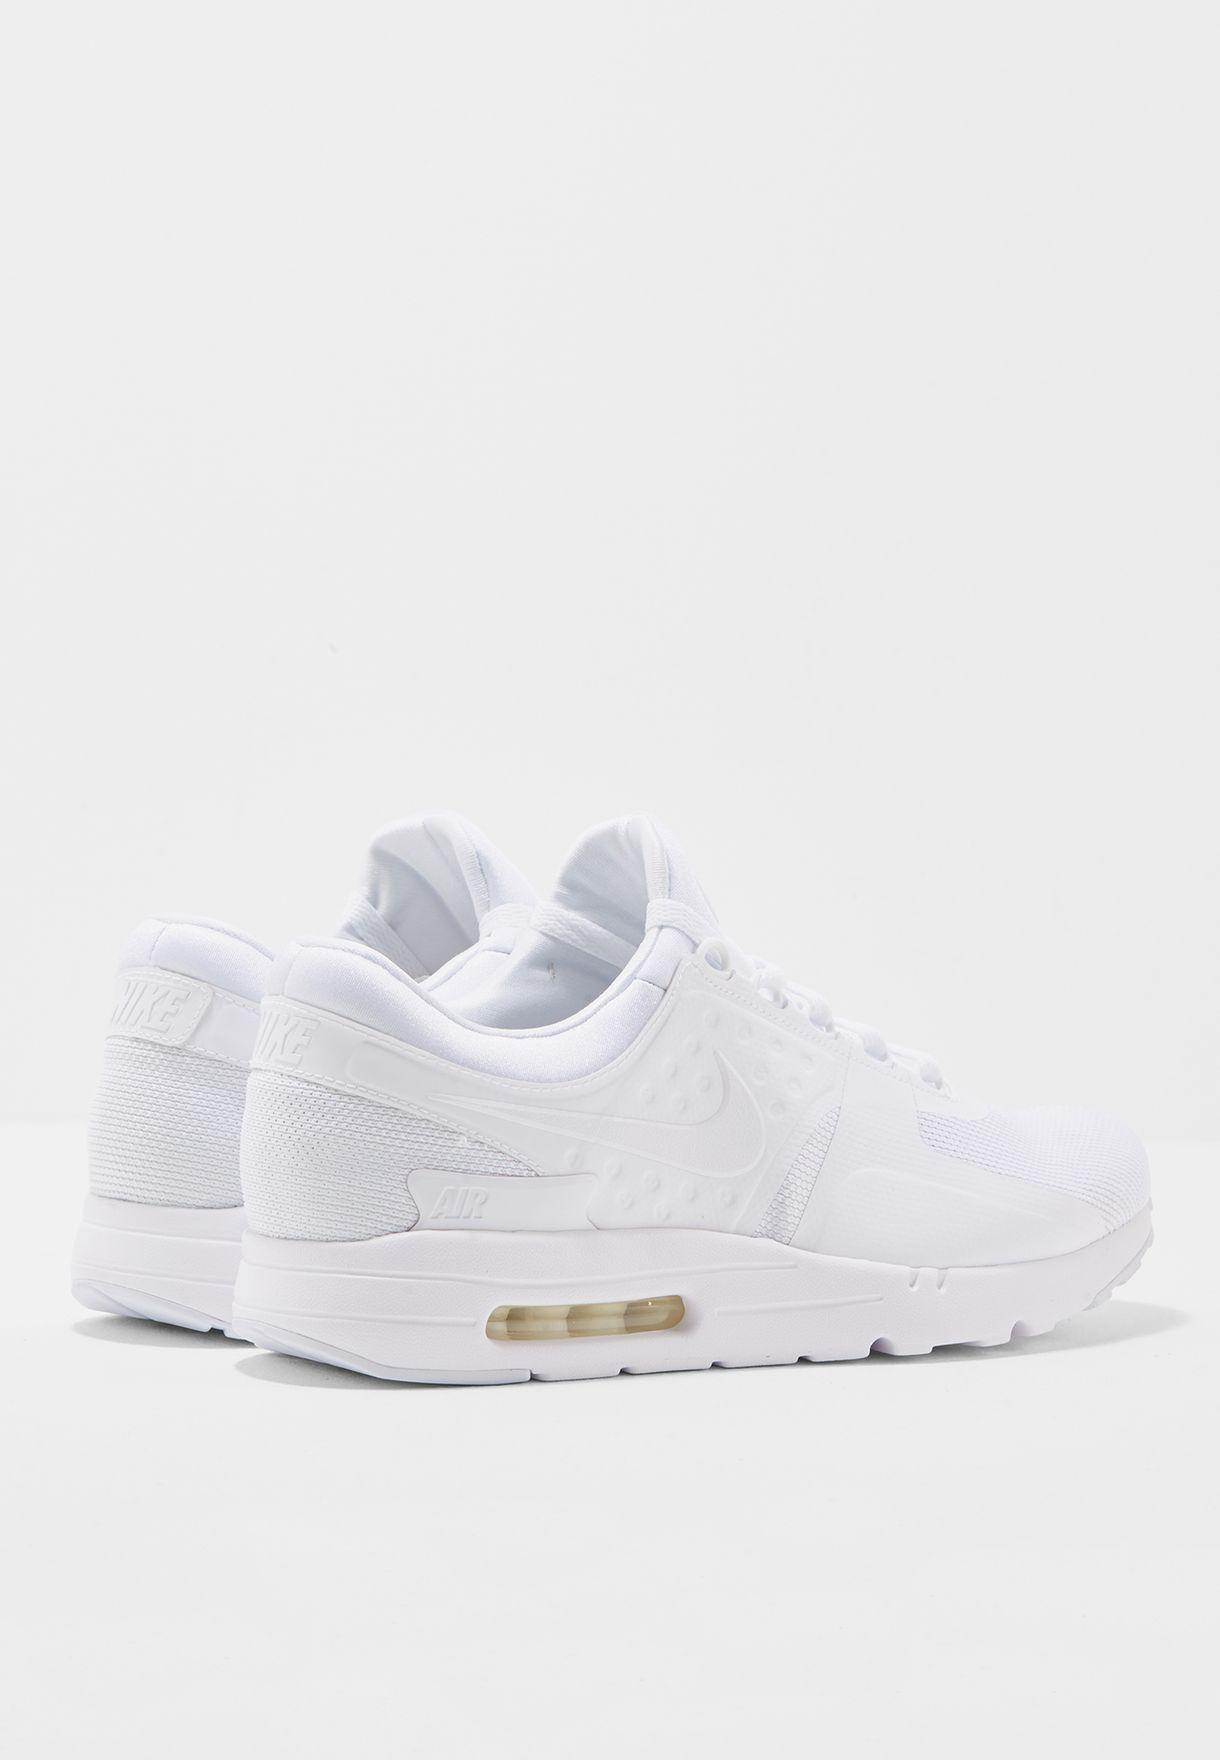 Nike Air Max Zero Essential Men's Shoe Size 11.5 (Black